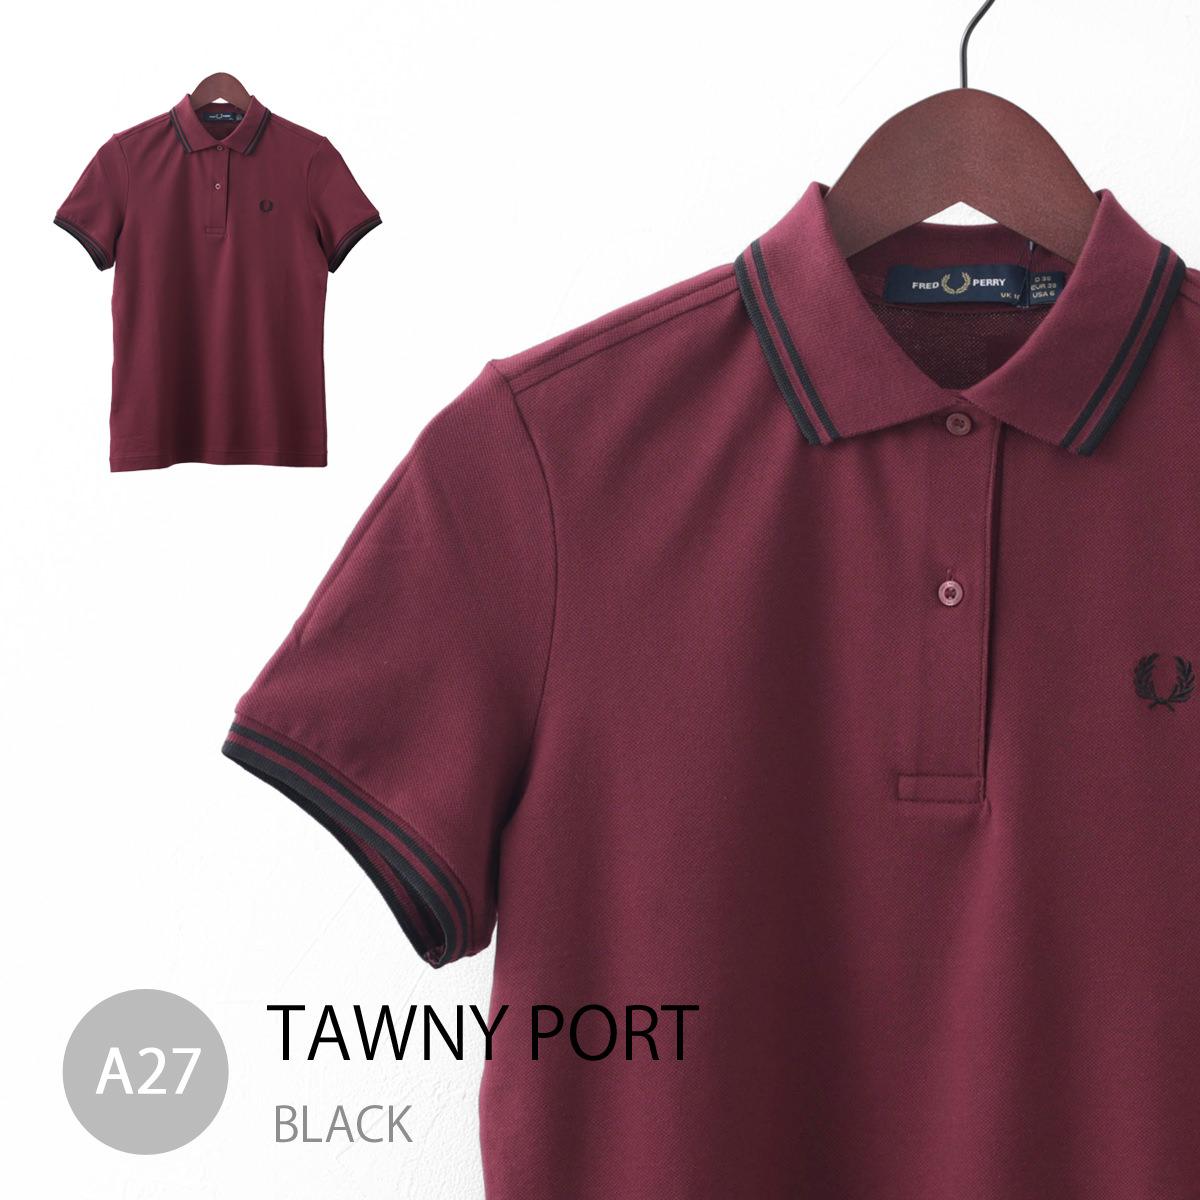 Fred Perry フレッドペリー レディース ポロシャツ G3600 ティップライン 5色 正規販売店